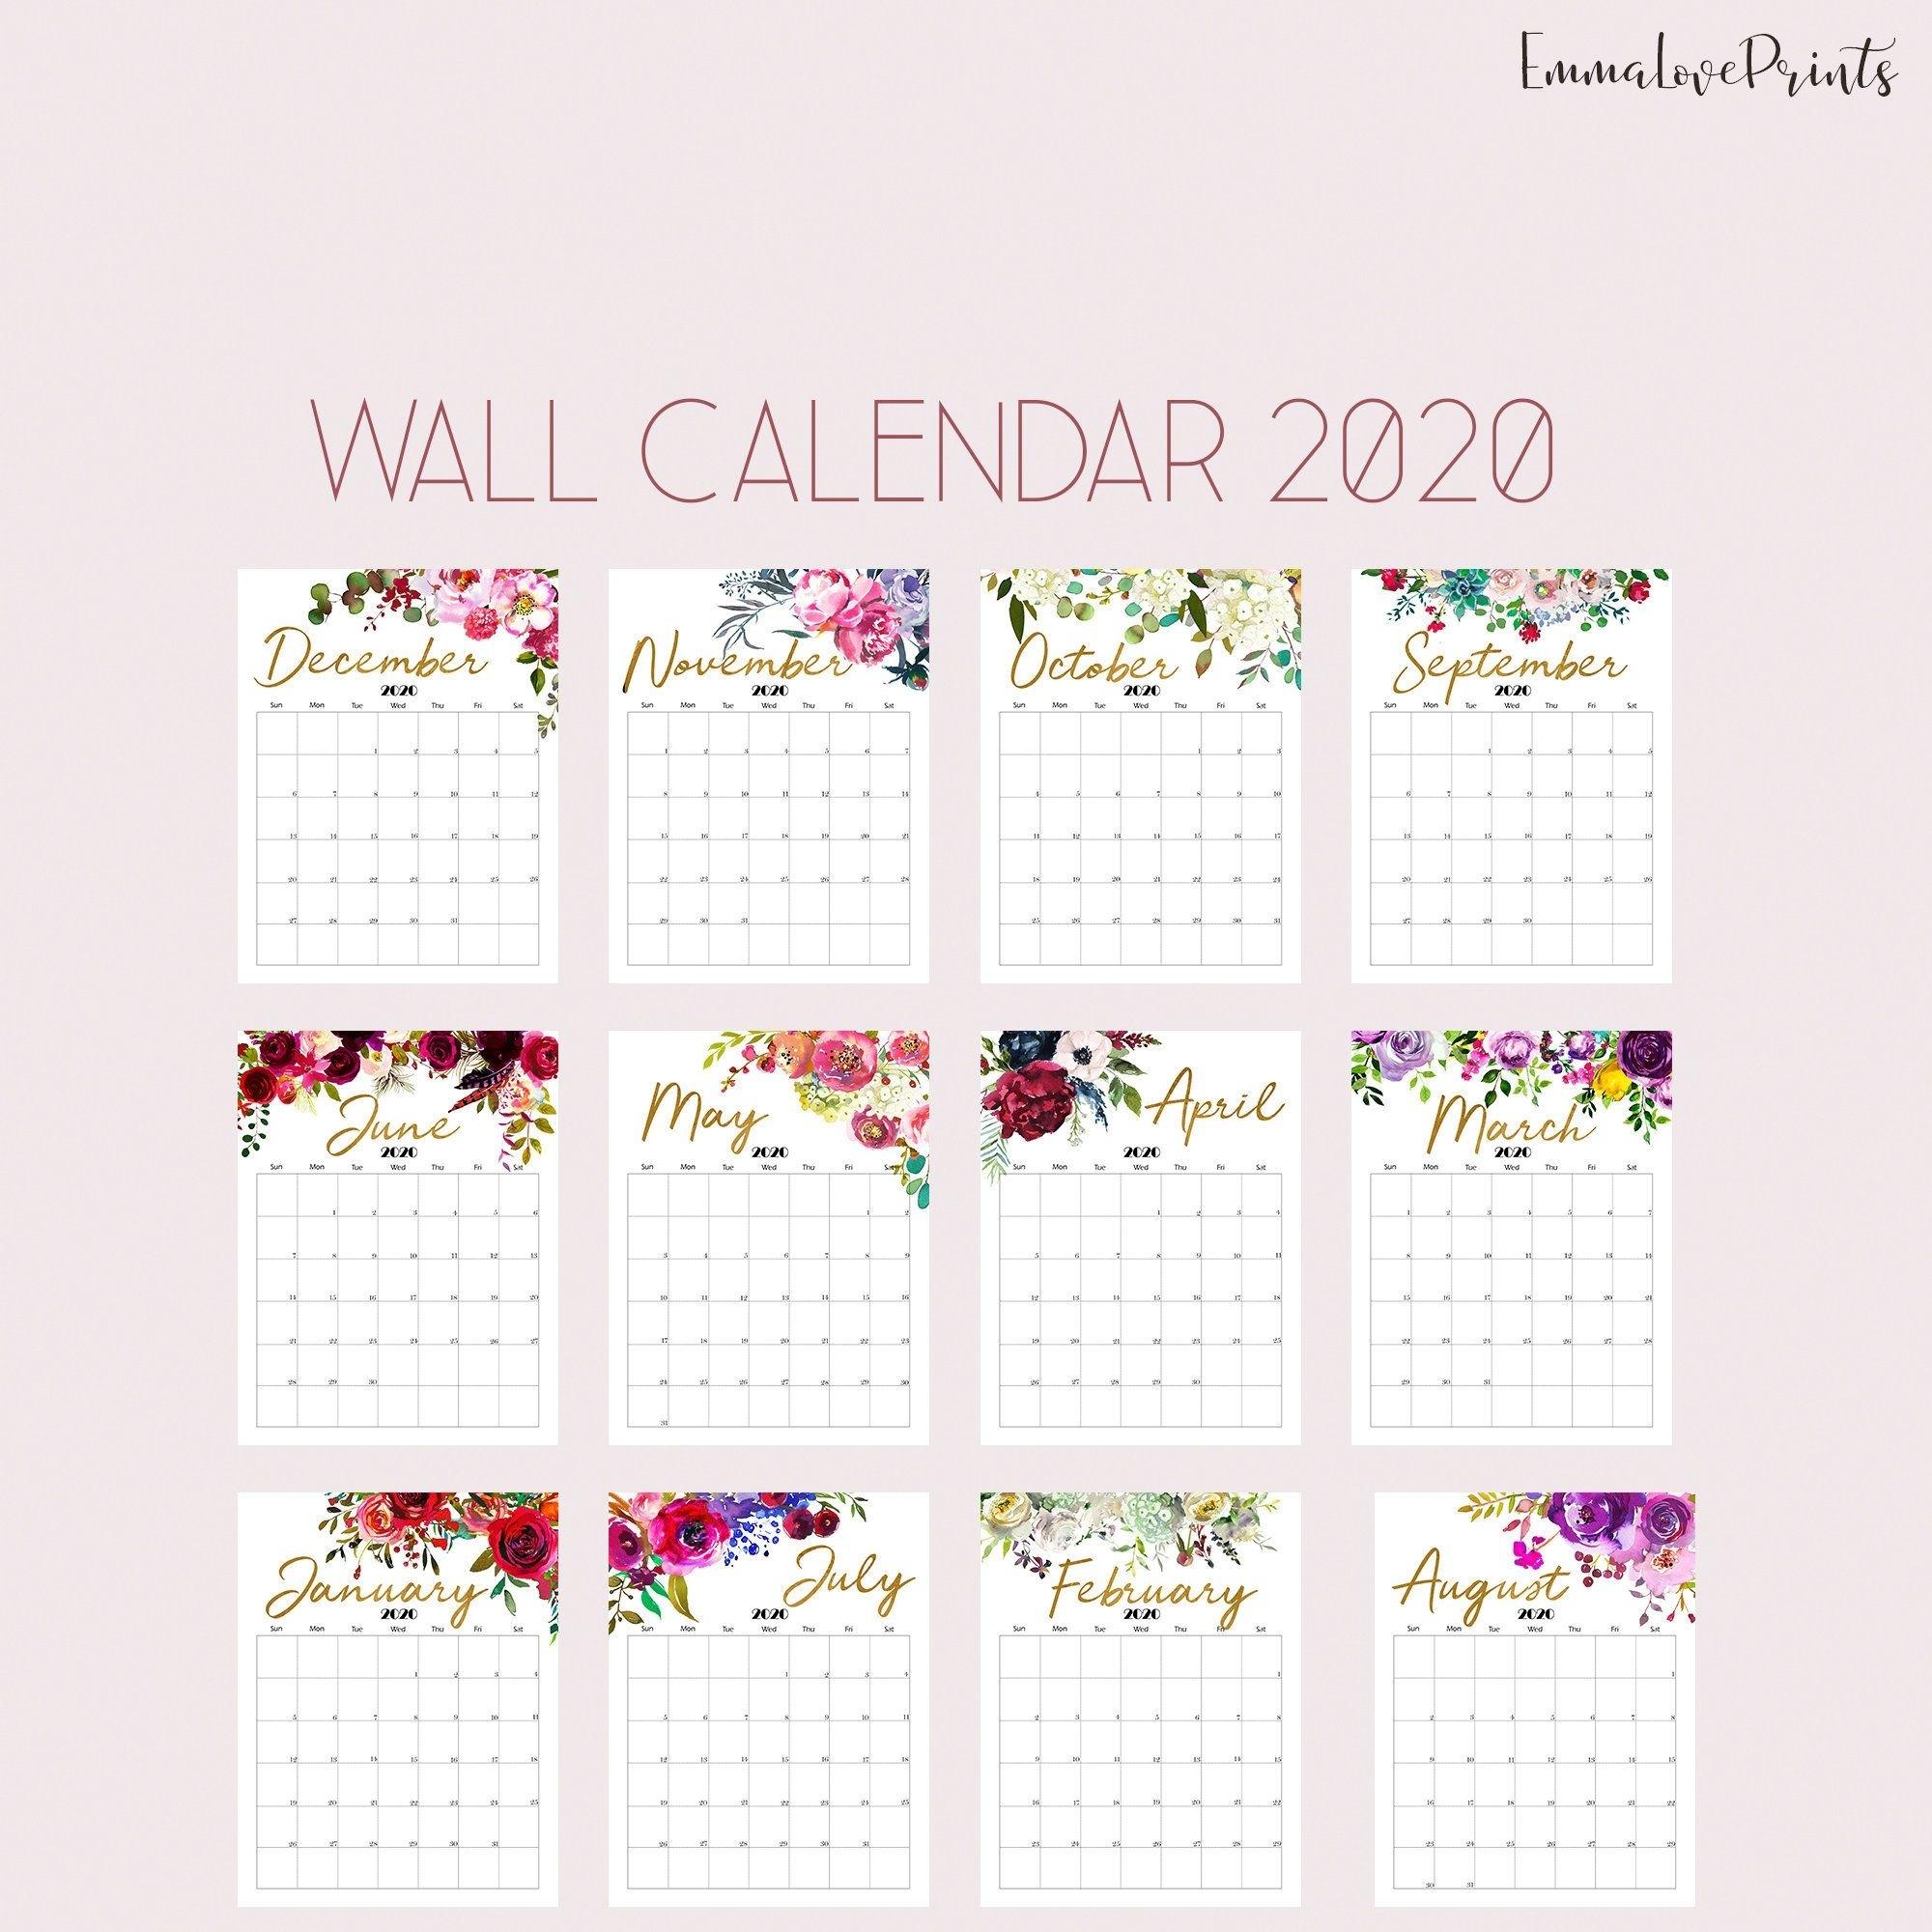 Printable Calendar 2020 Wall Calendar 2020 Desk Calendar, Floral with regard to U Of L 2019/2020 Calendar